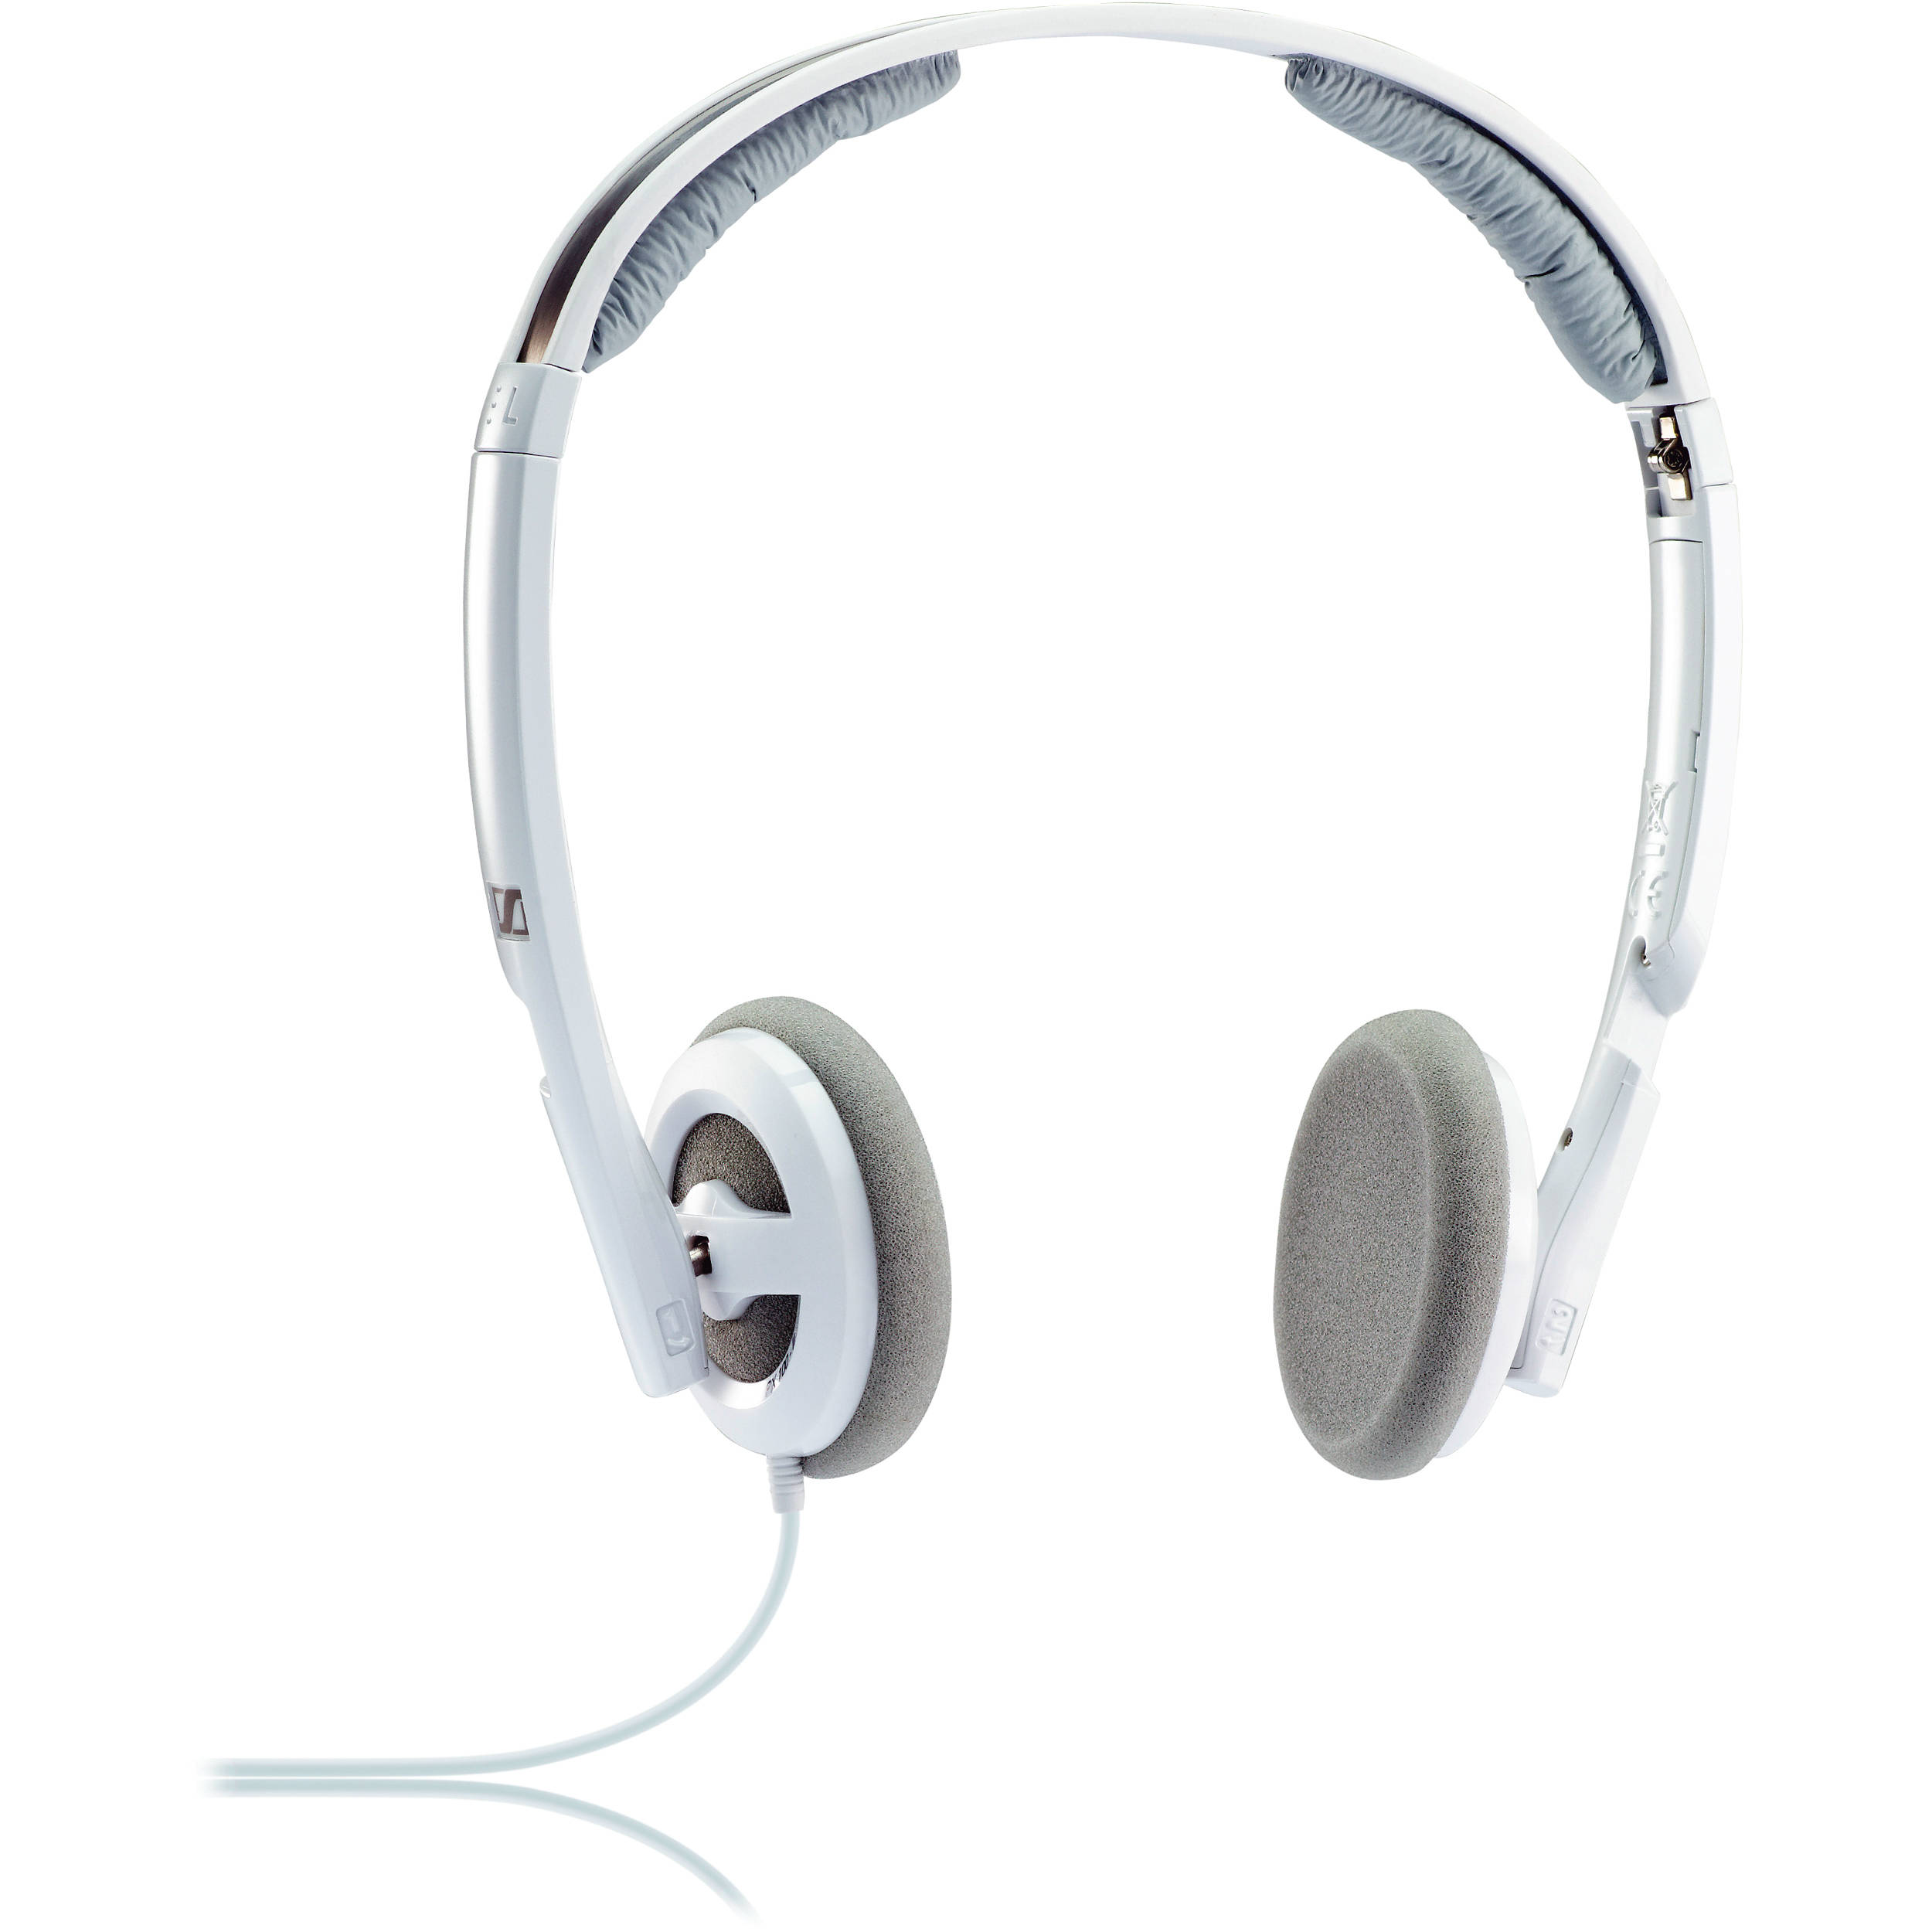 sennheiser px 100 ii on ear stereo headphones white px100 iii. Black Bedroom Furniture Sets. Home Design Ideas